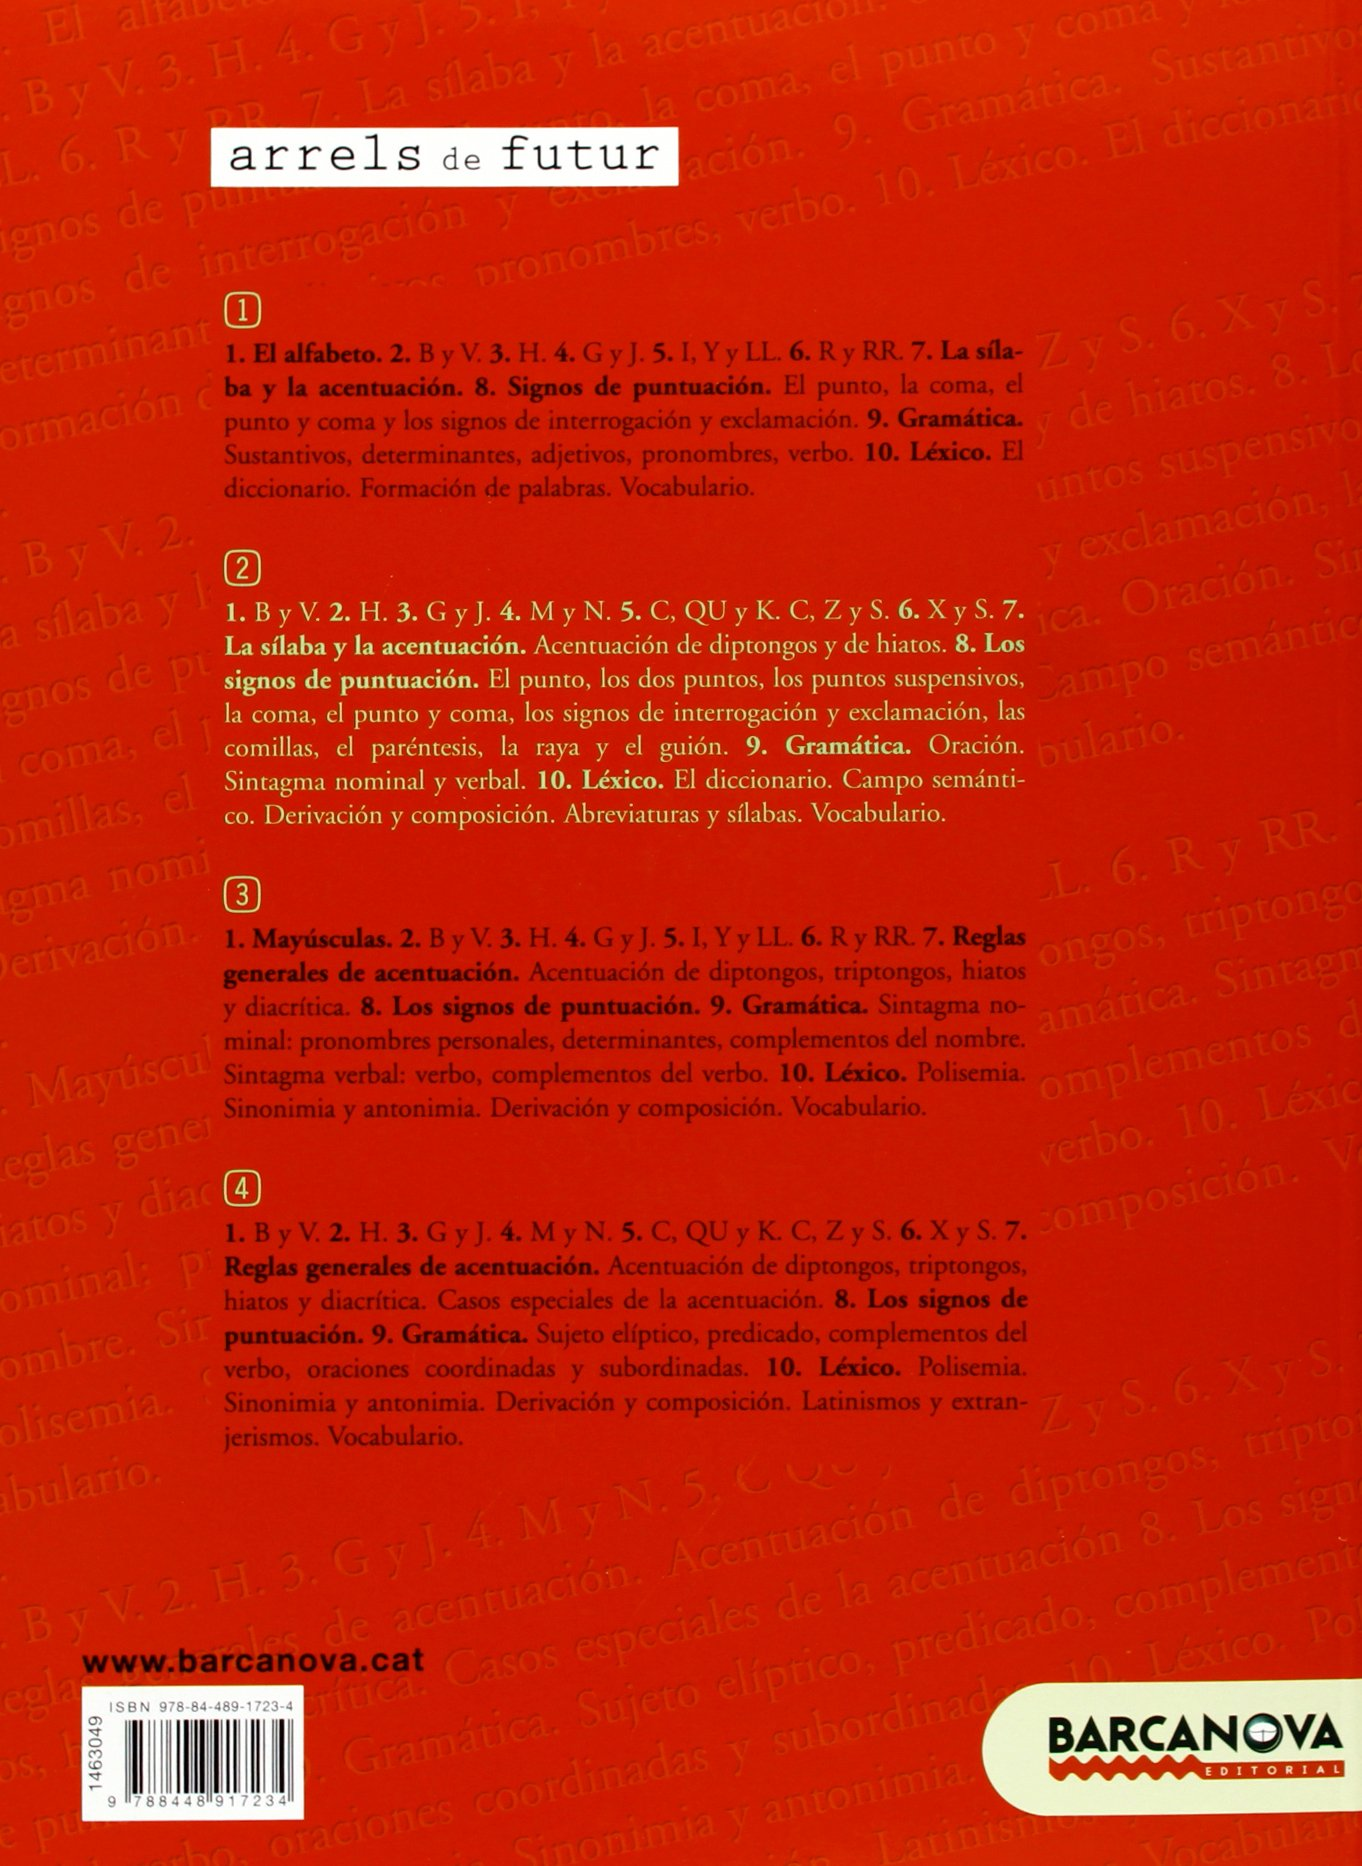 Cuaderno de refuerzo de lengua castellana 2 Materials Educatius - Eso - Lengua Castellana - 9788448917234: Amazon.es: Francisca Ezquerra Lezcano: Libros